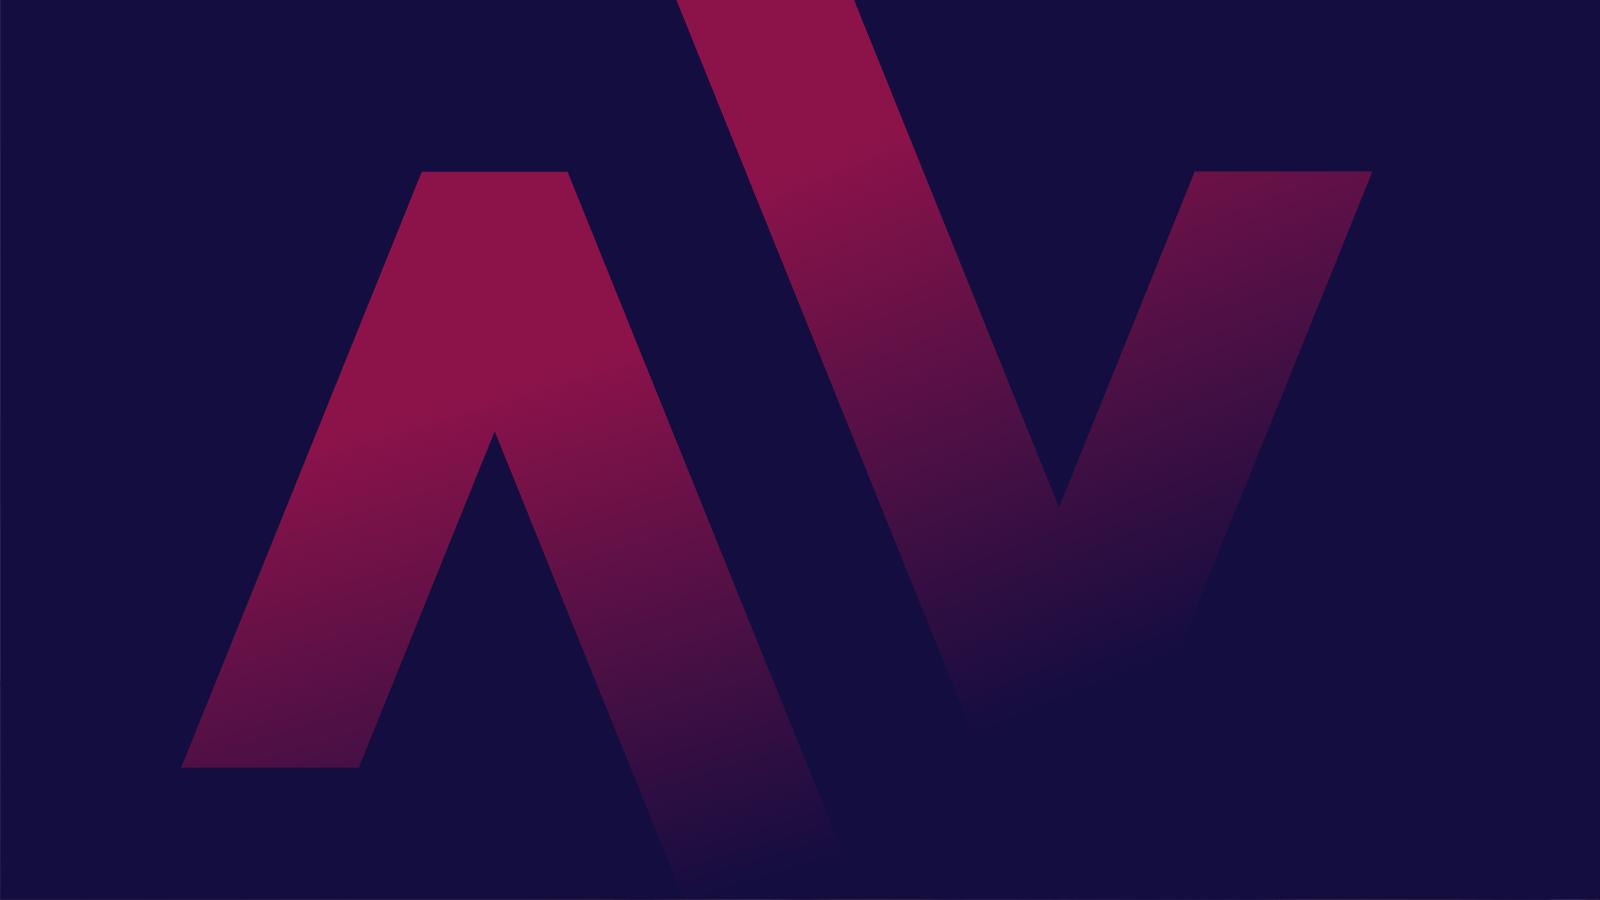 naveo comemrce symbol design by Leeds based Freelance Designer Neil Holroyd